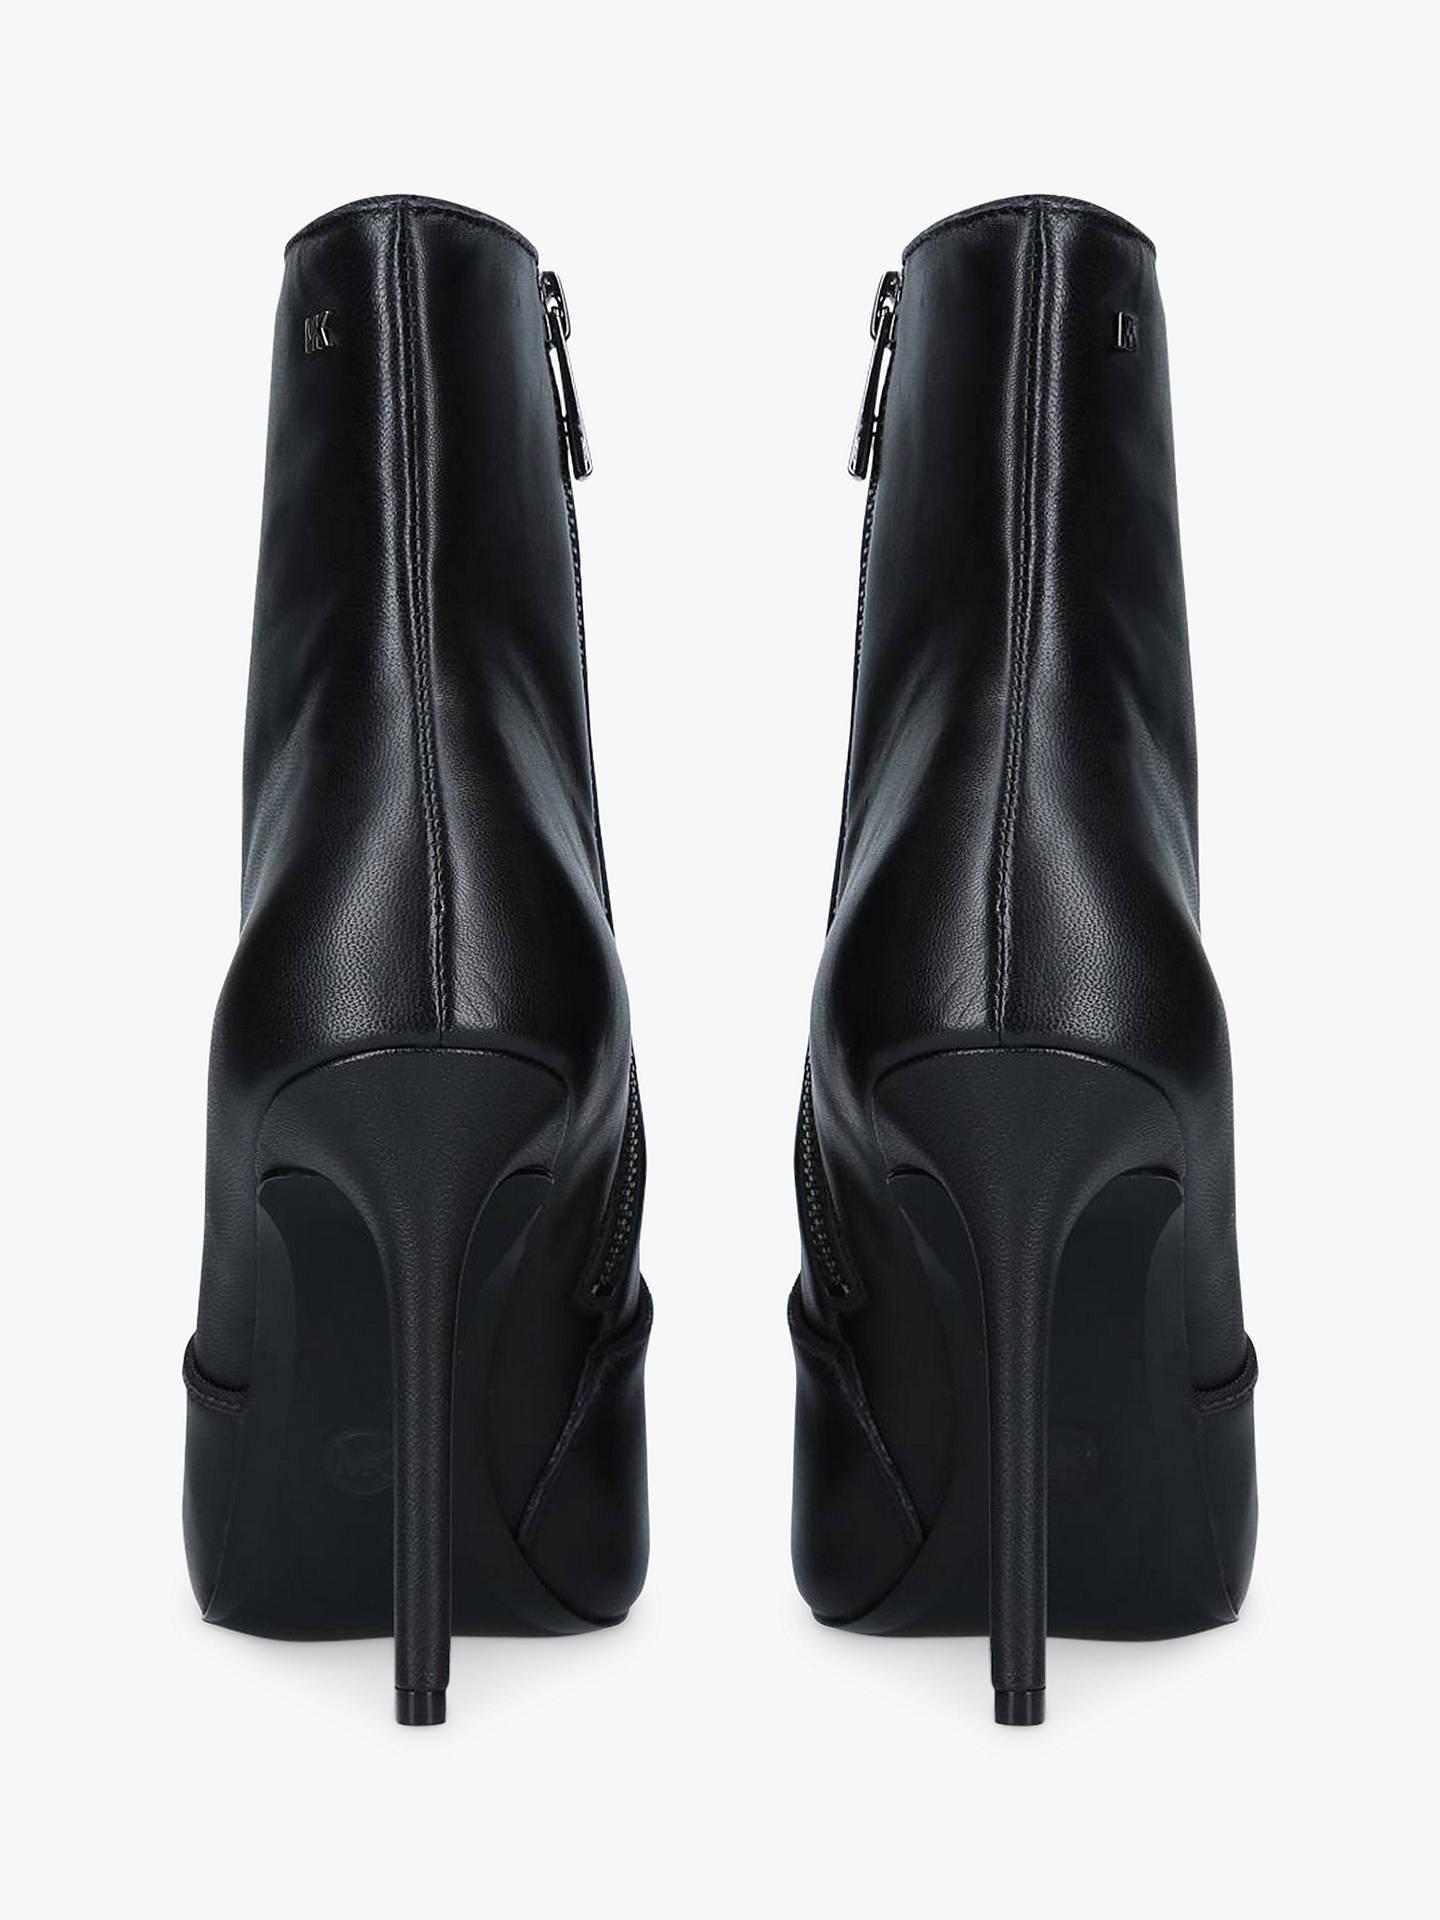 83a48df93b5b ... Buy MICHAEL Michael Kors Blaine Stiletto Heel Ankle Boots